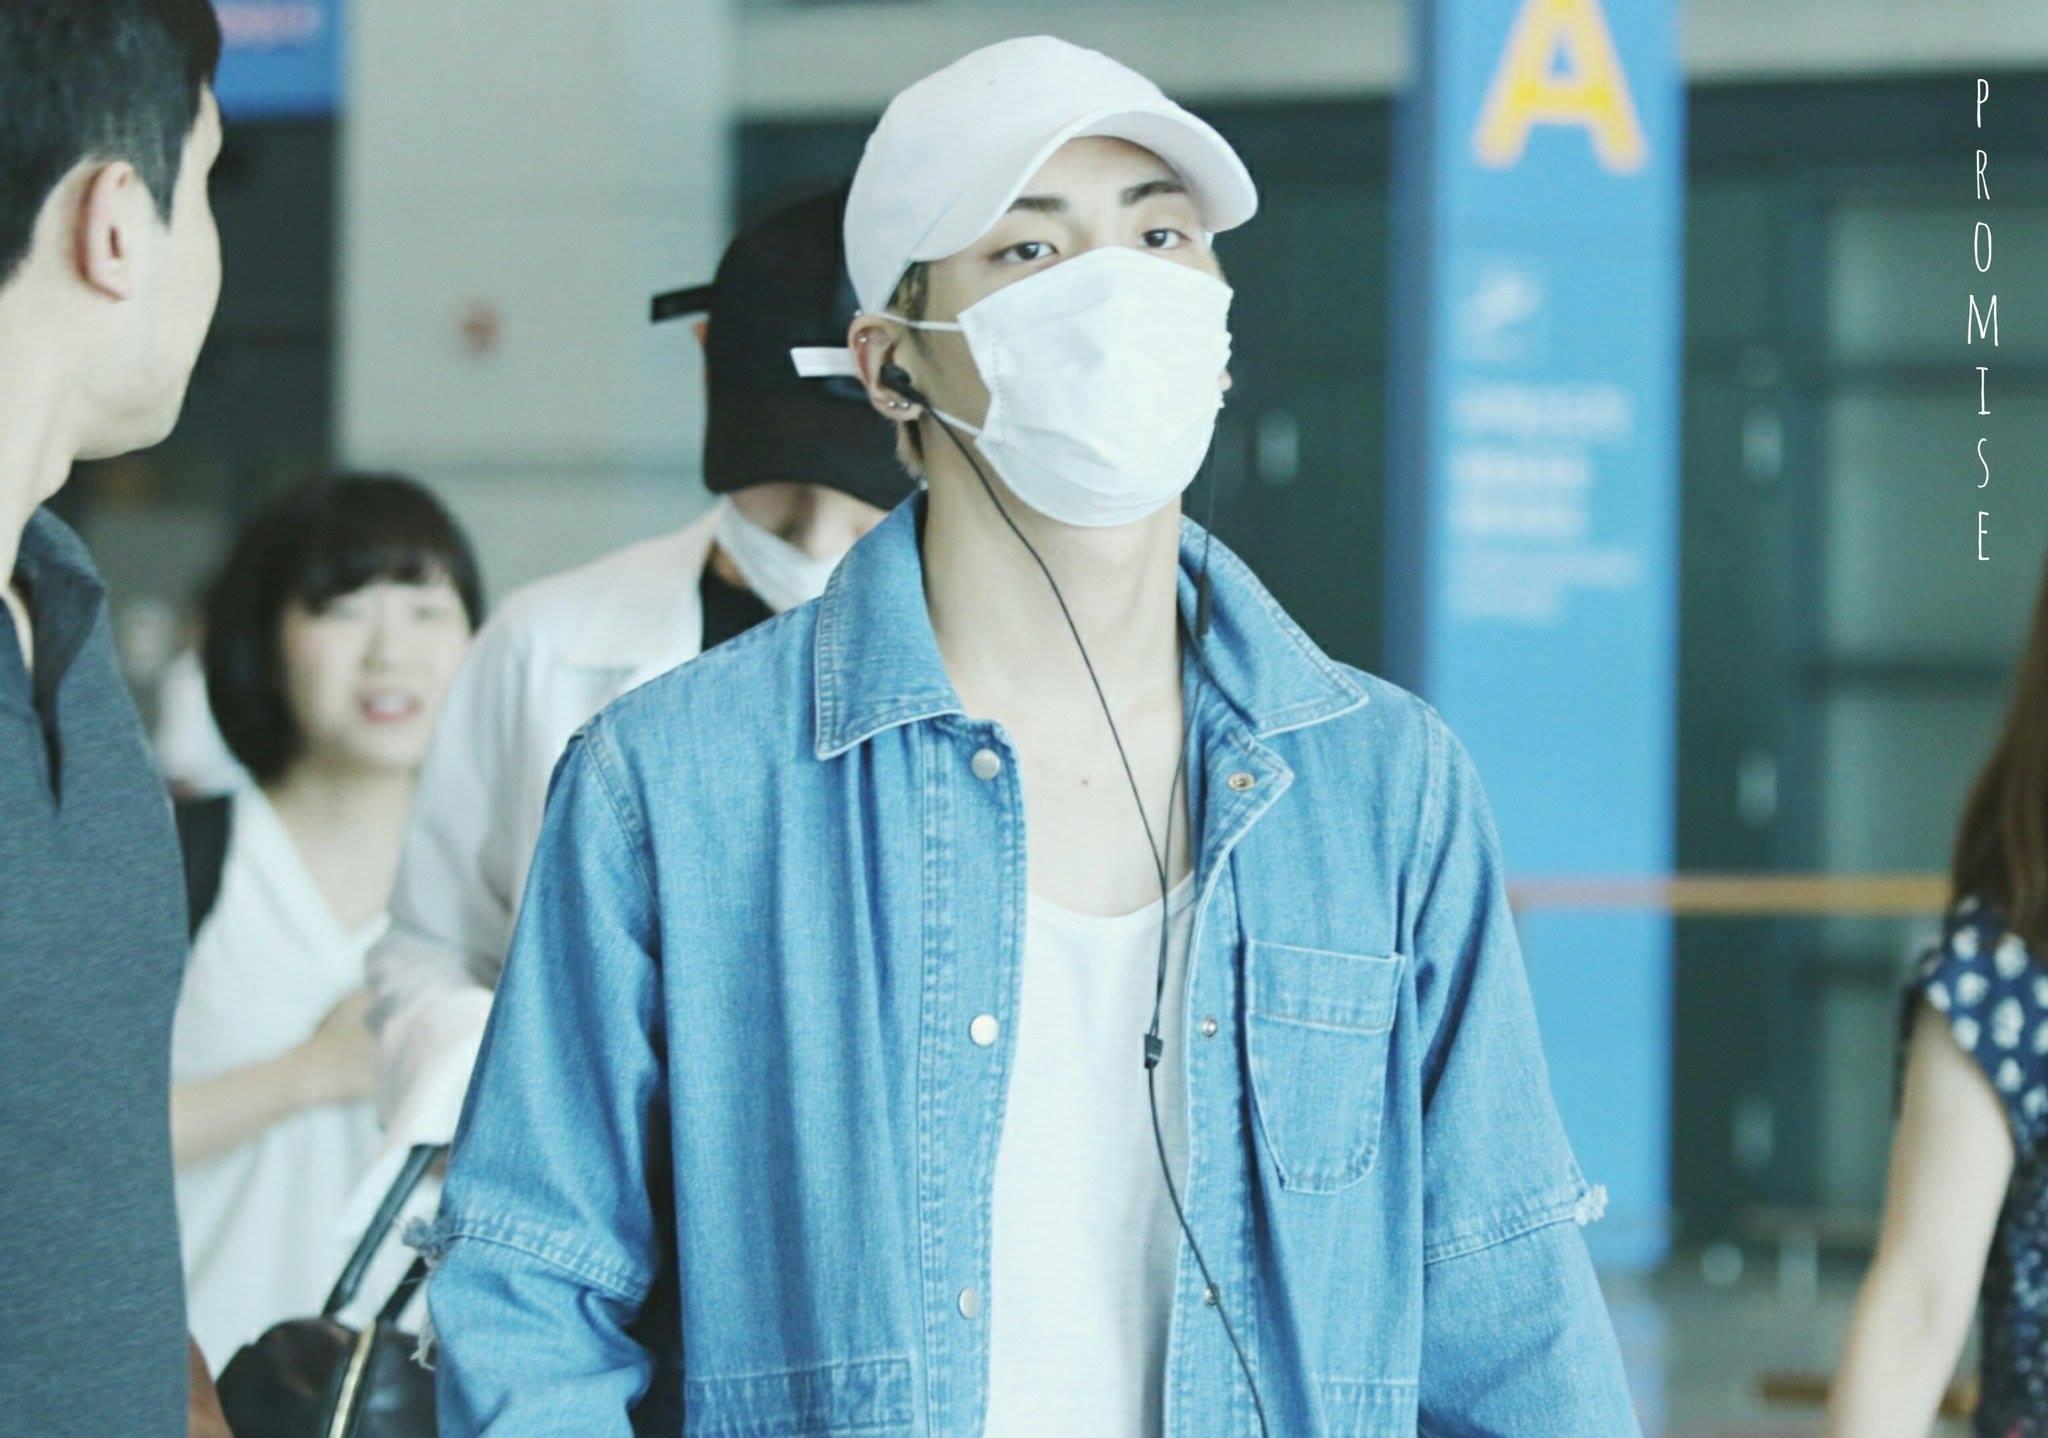 [IMG/160718] Onew, Jonghyun, Key, Minho @Aeropuerto de Kansai e Incheon (Jap-Cor) KhfTgPcE